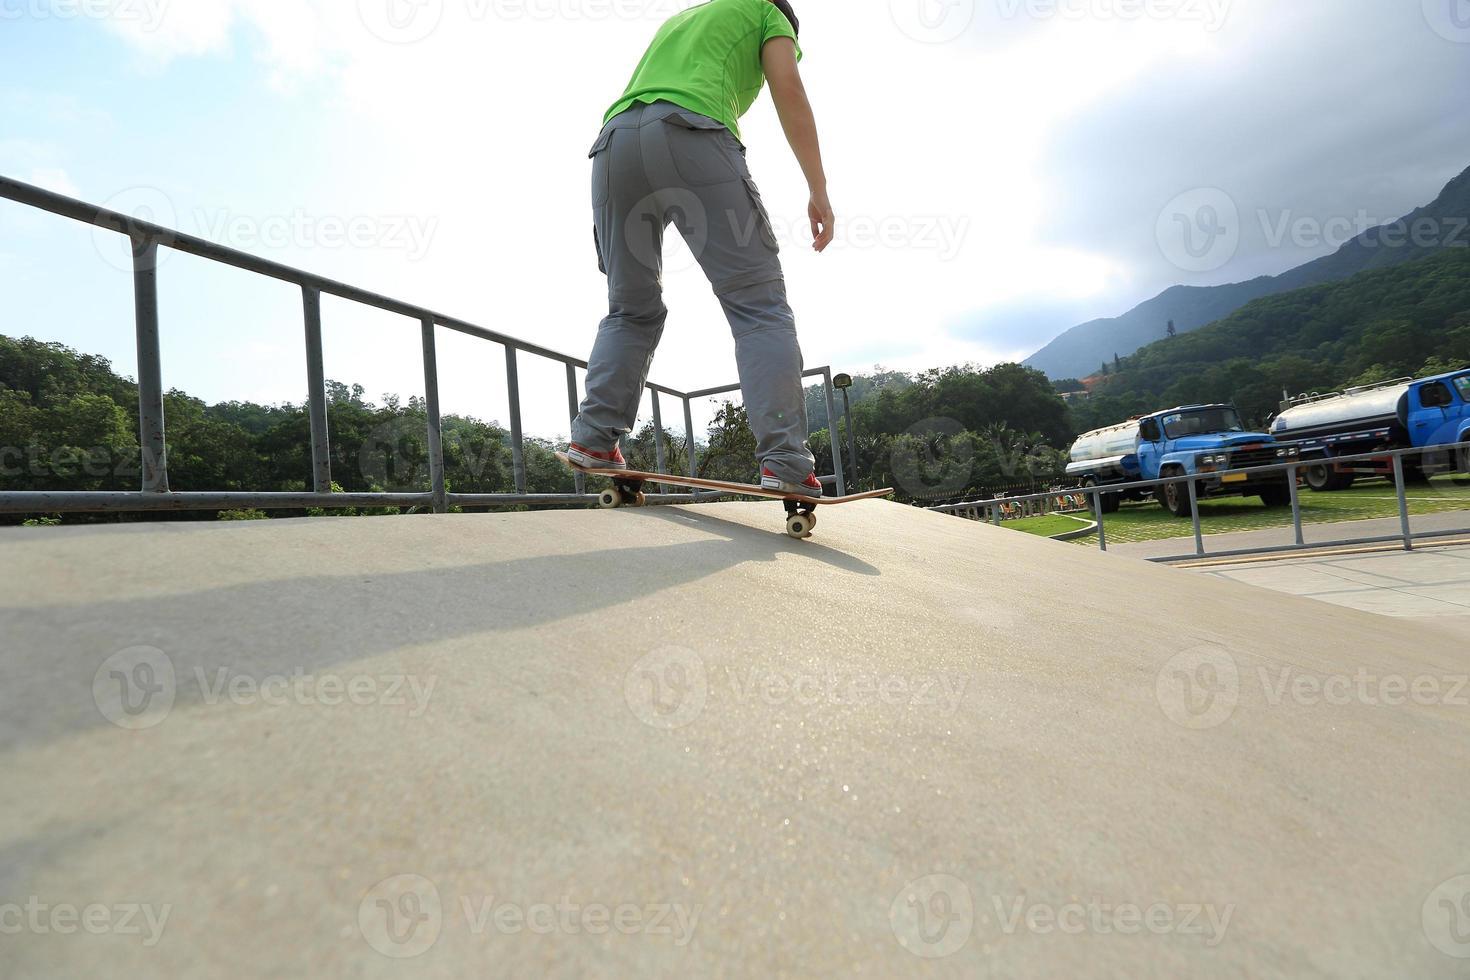 Skateboarding im Skatepark foto